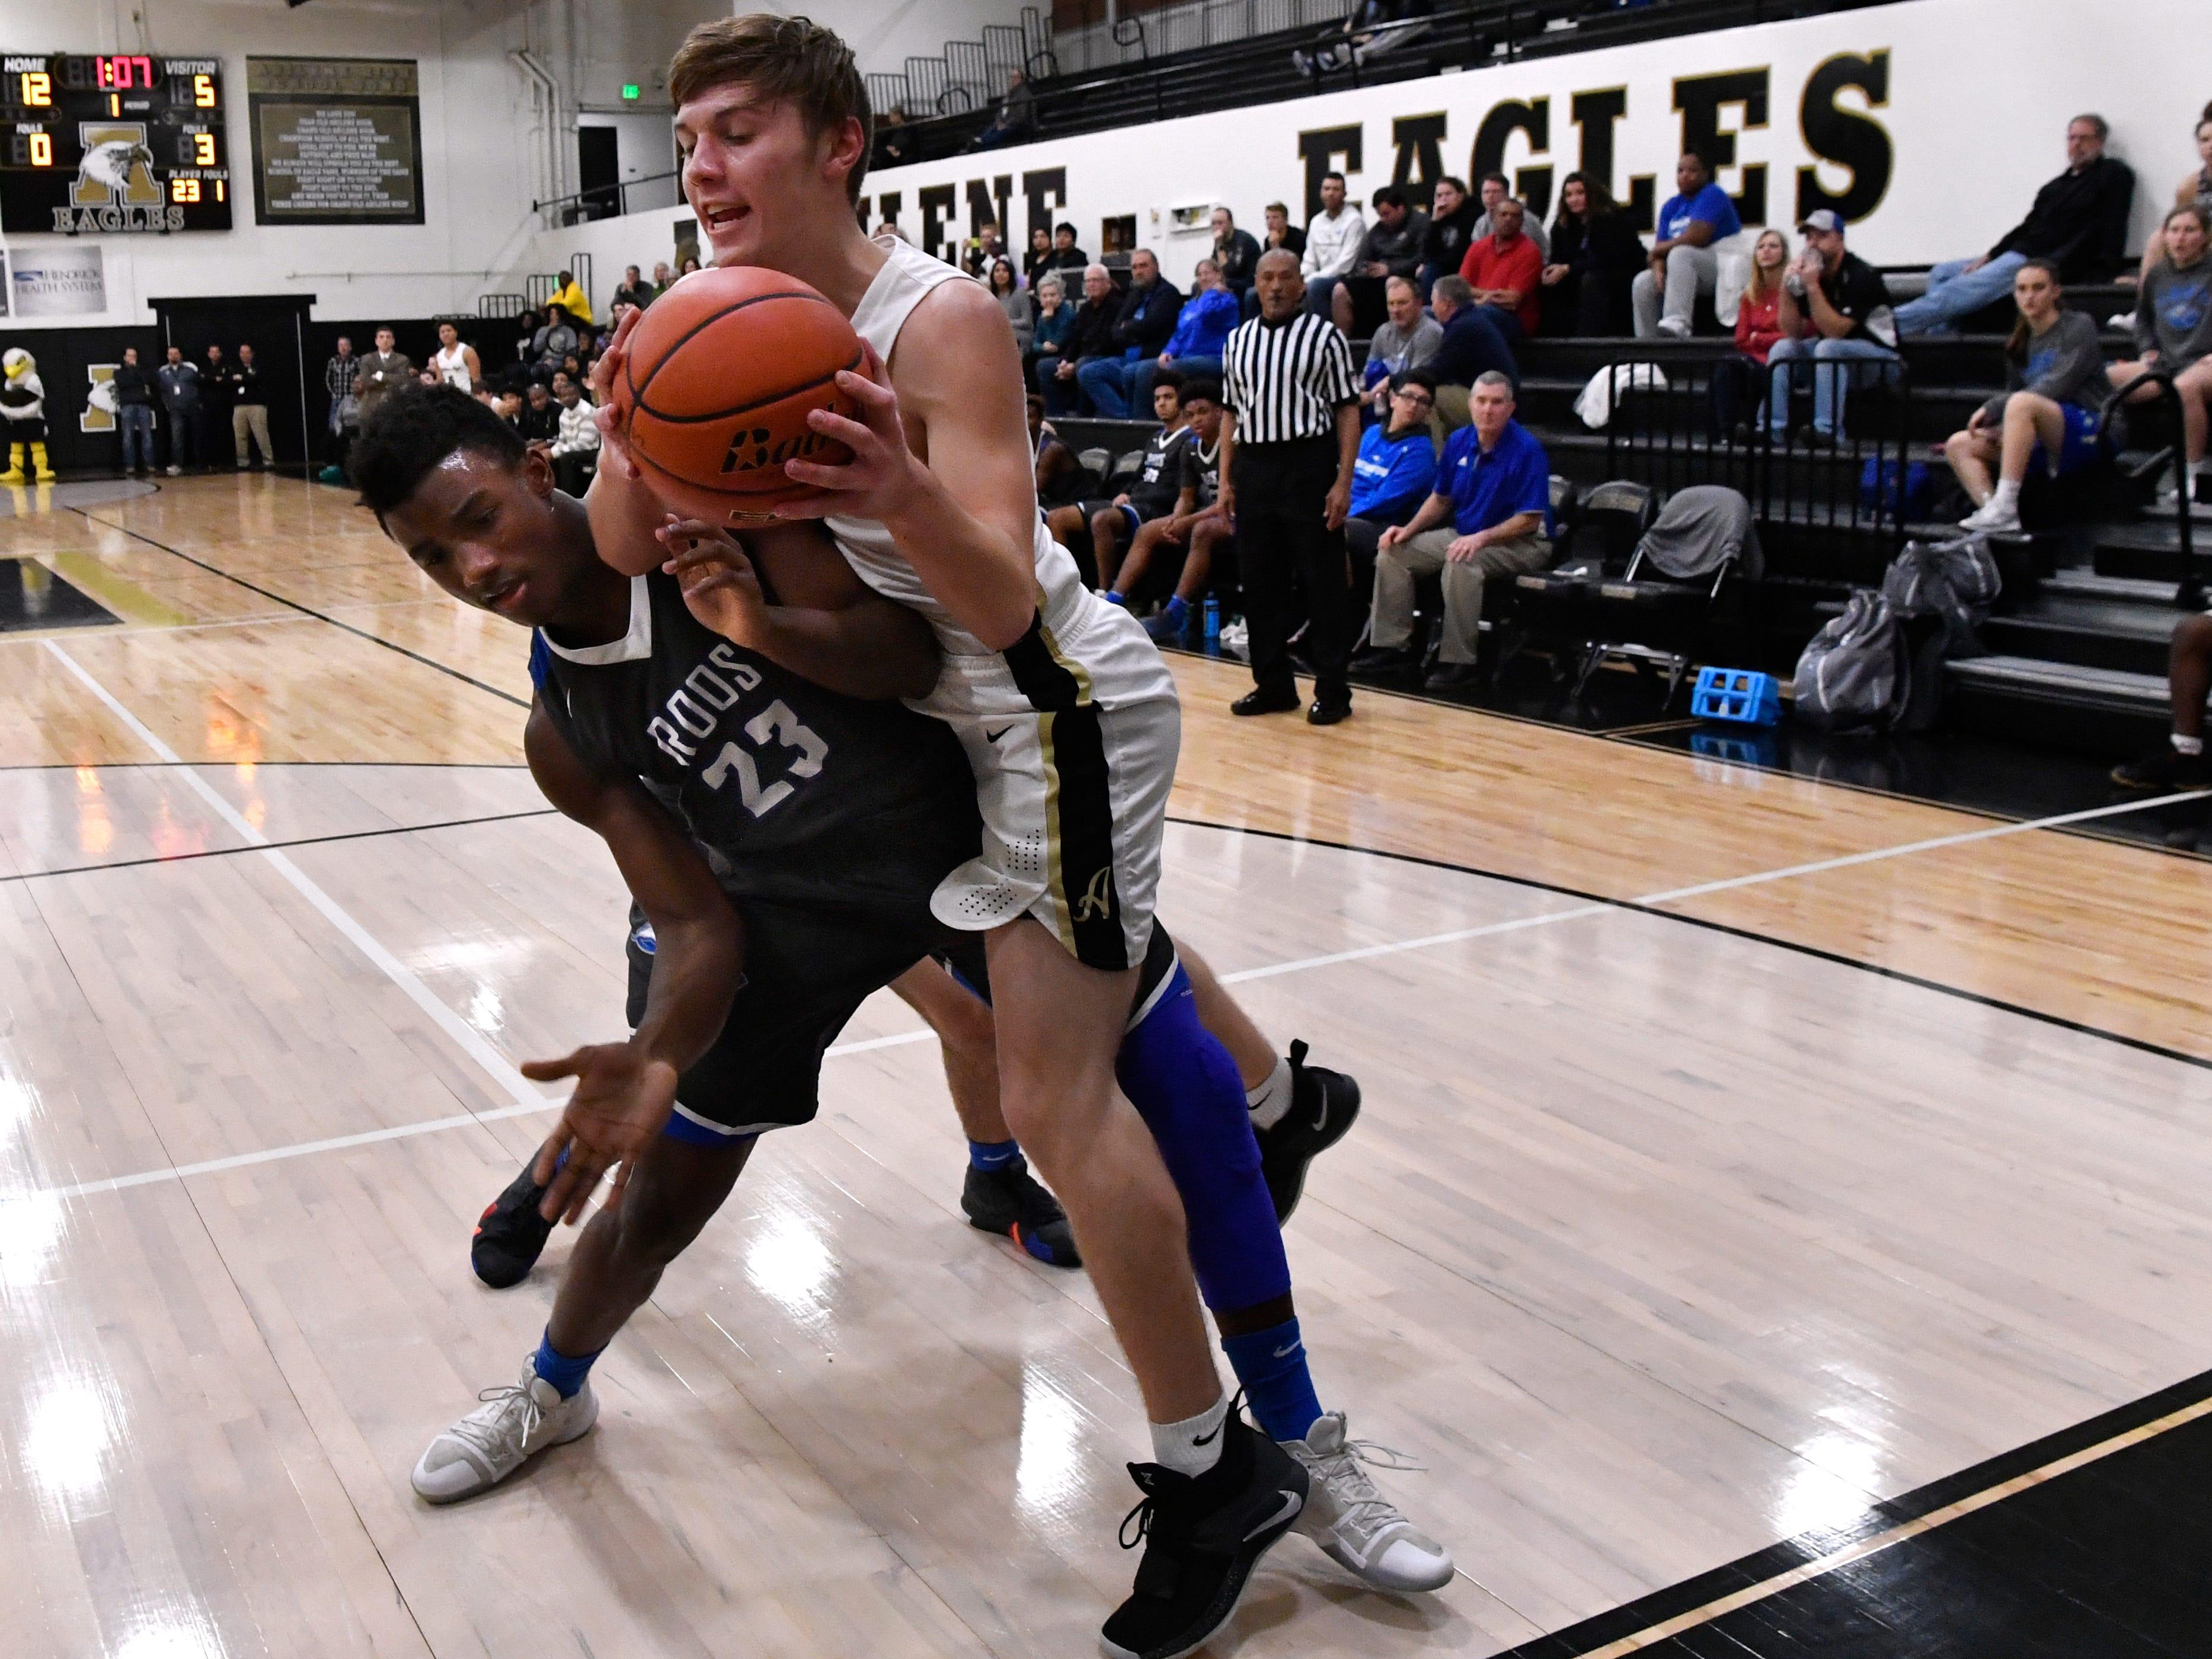 Abilene High's Jackson Stevens comes down onto Weatherford's Brett Blevins during Friday's game in the Eagle Gym Jan. 11, 2019. Final score was 74-49, Abilene.